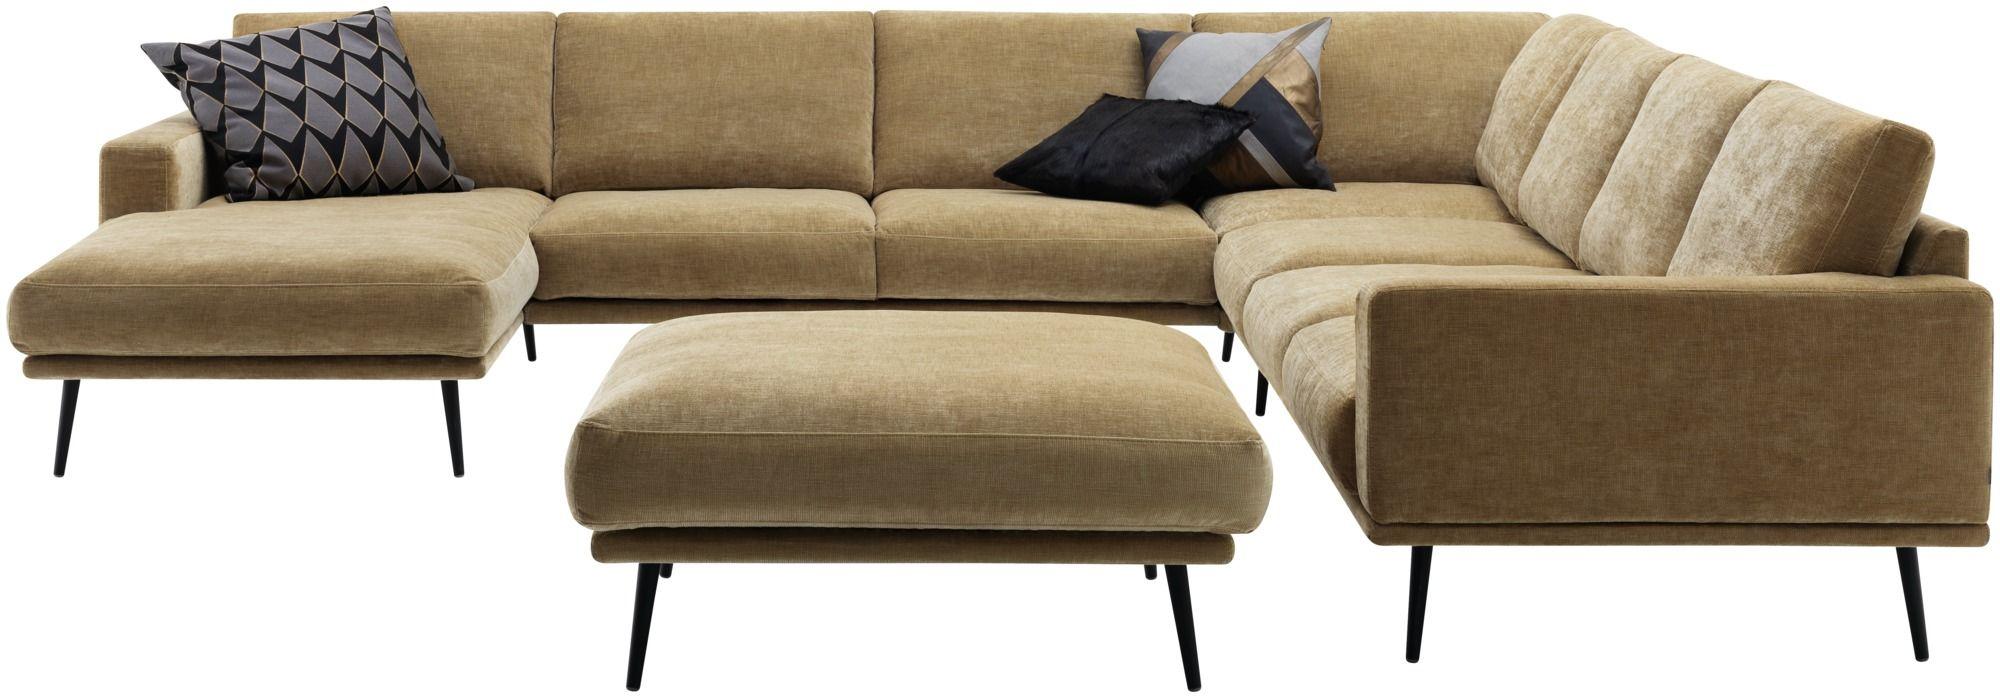 Canapé D Angle Design